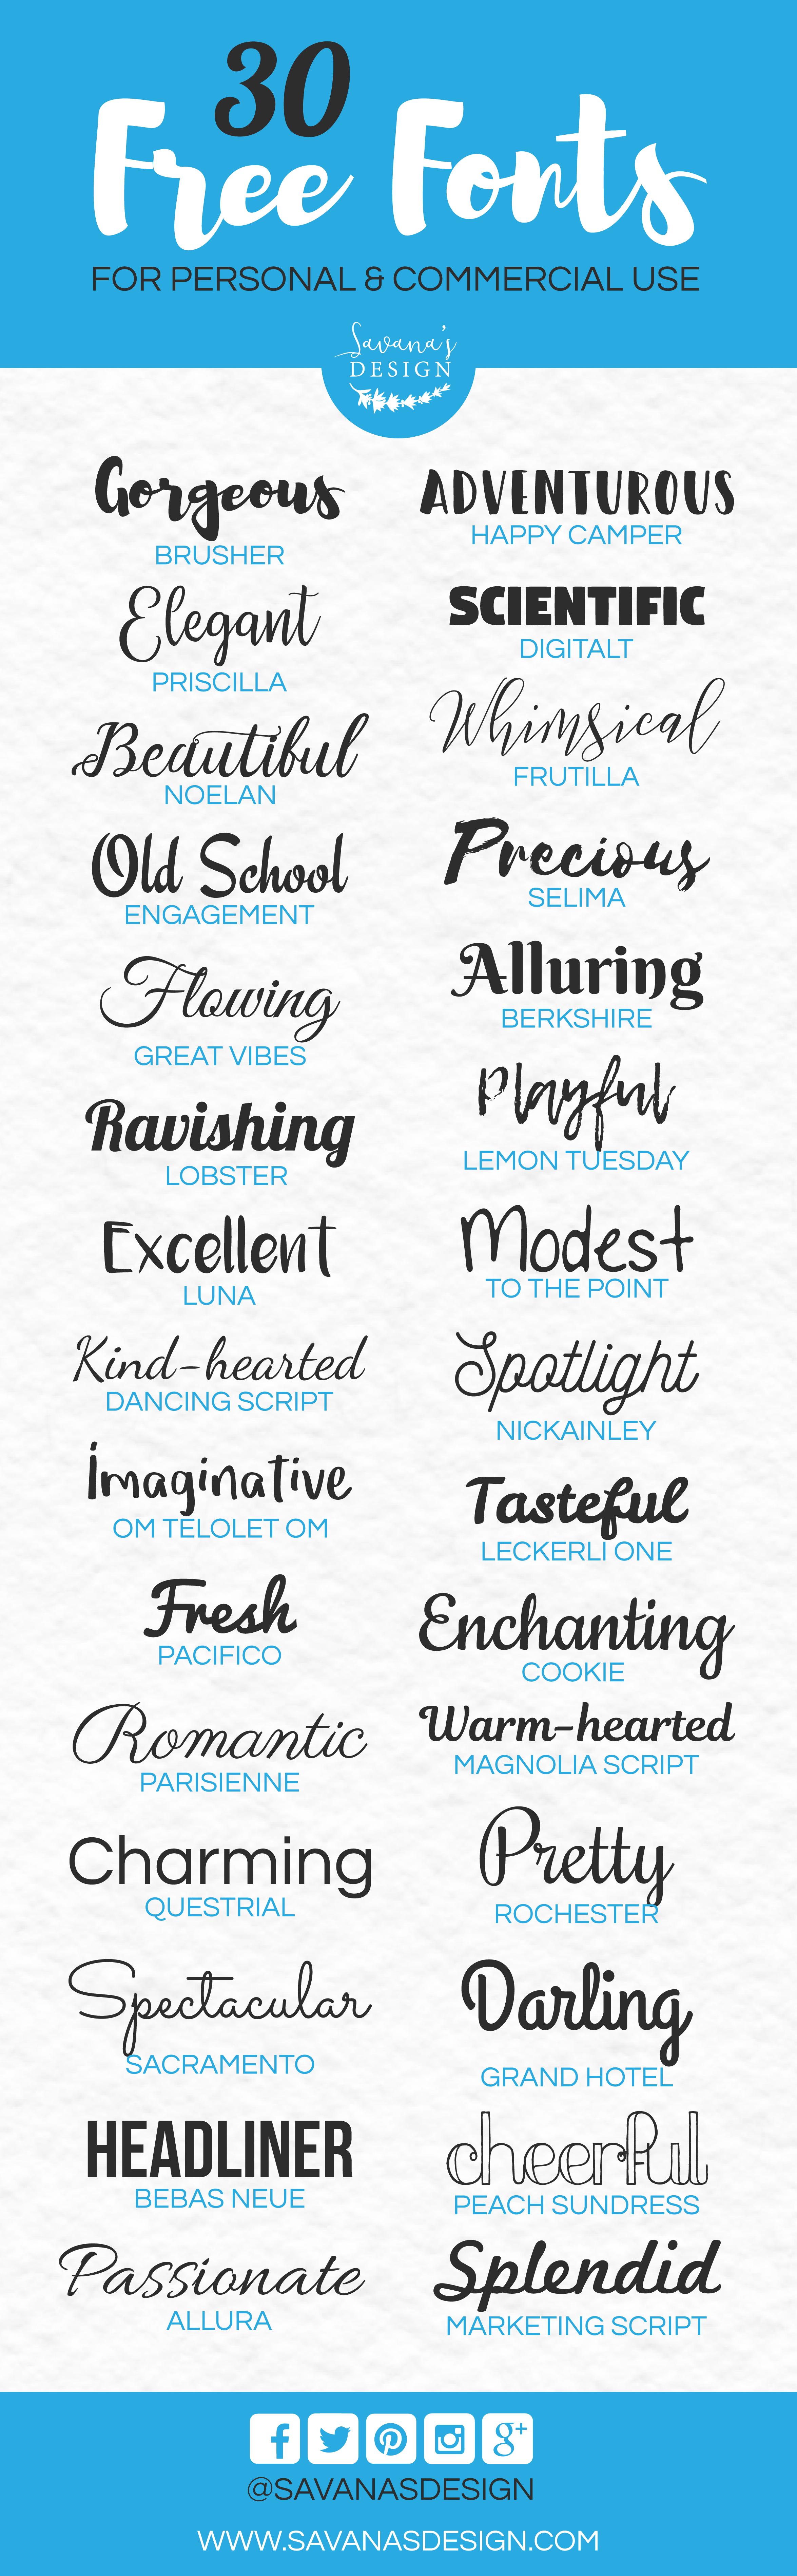 Best Commercial Use Free Fonts & Top Free Designer Fonts